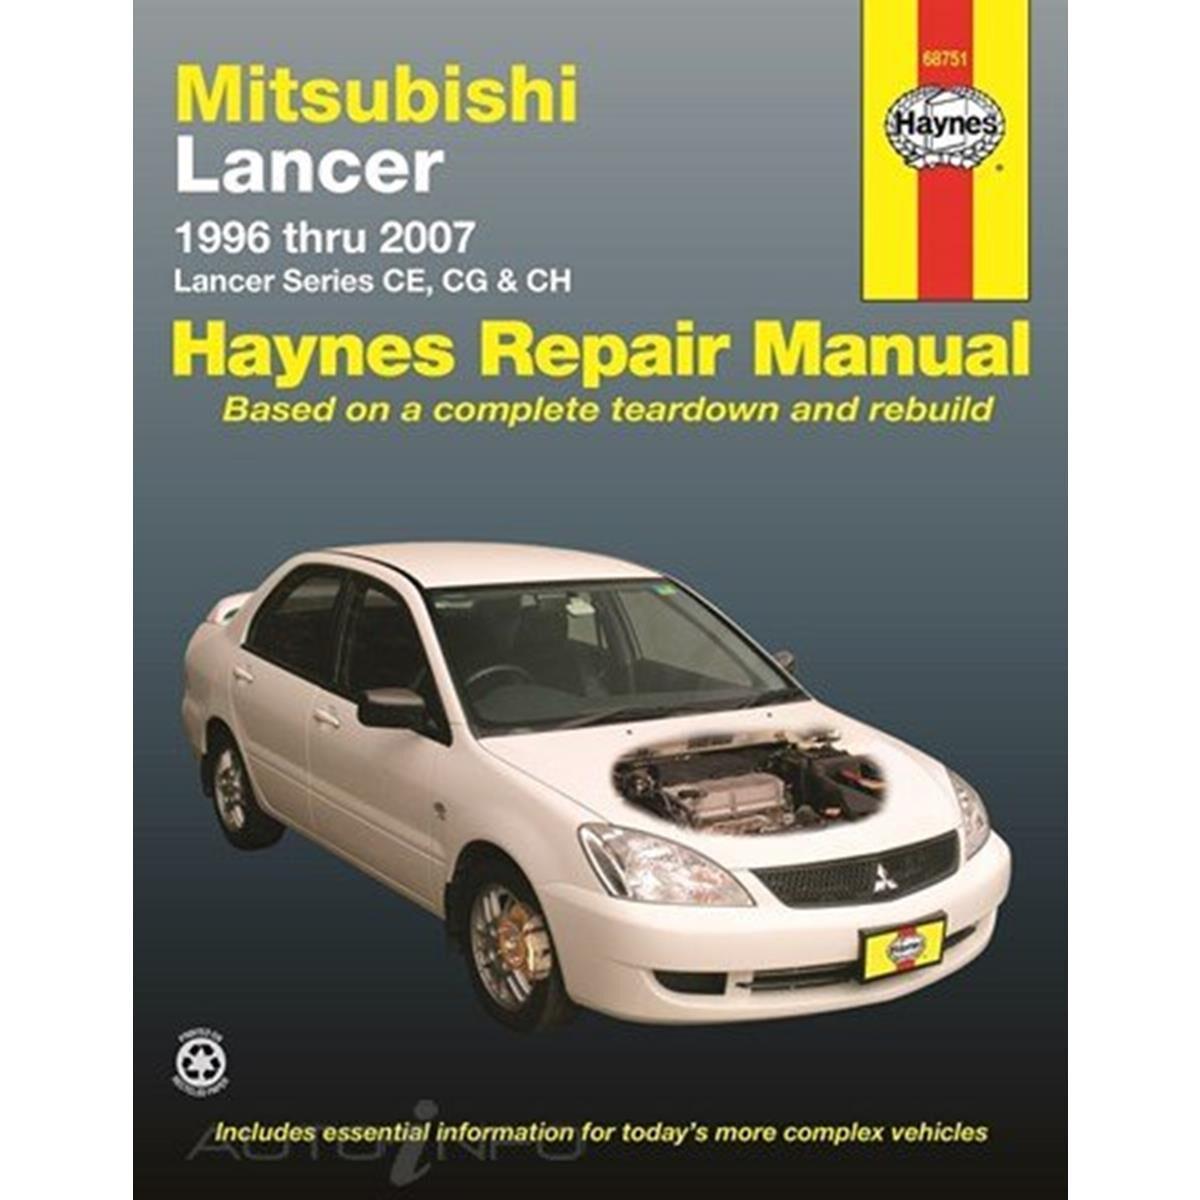 haynes supercheap auto rh supercheapauto com au 1997 mitsubishi mirage owners manual pdf 1996 Mitsubishi Lancer